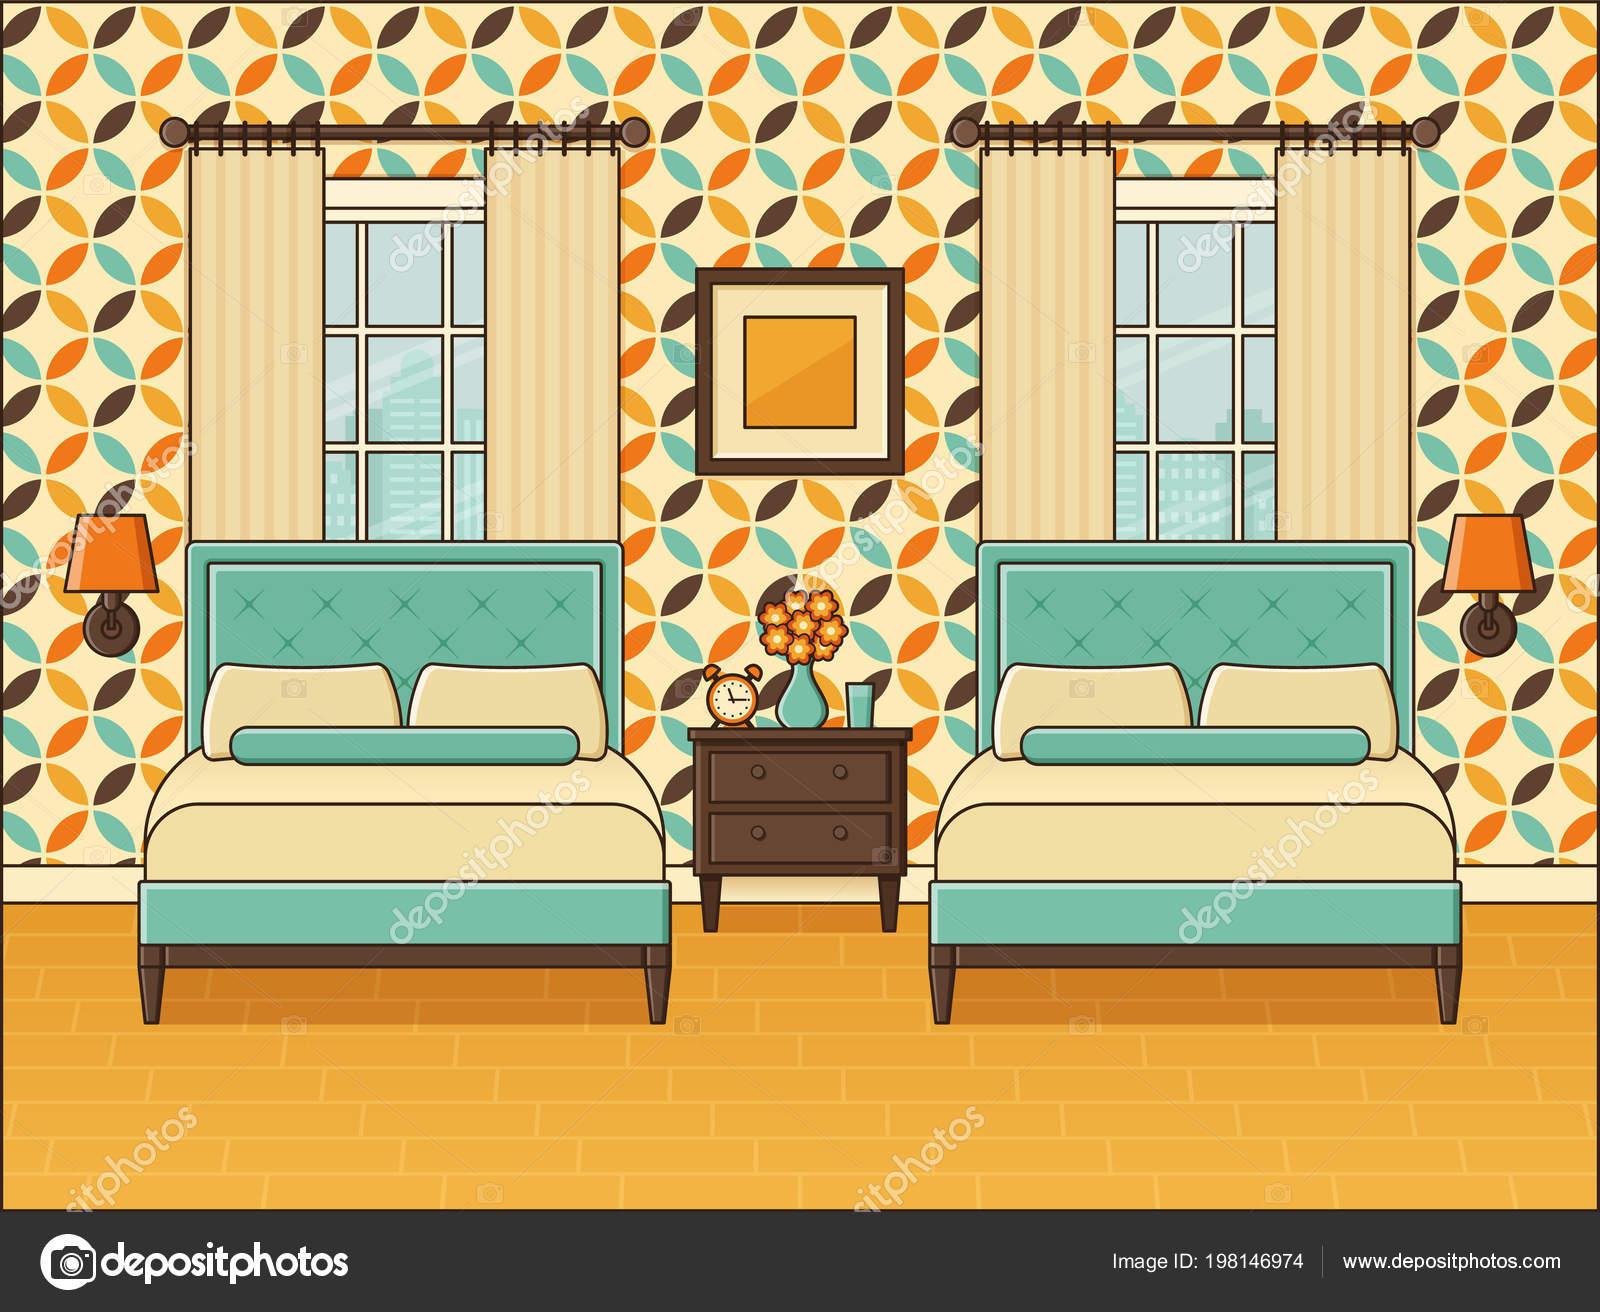 82 Animated Bedroom Image 2 Background Art Original